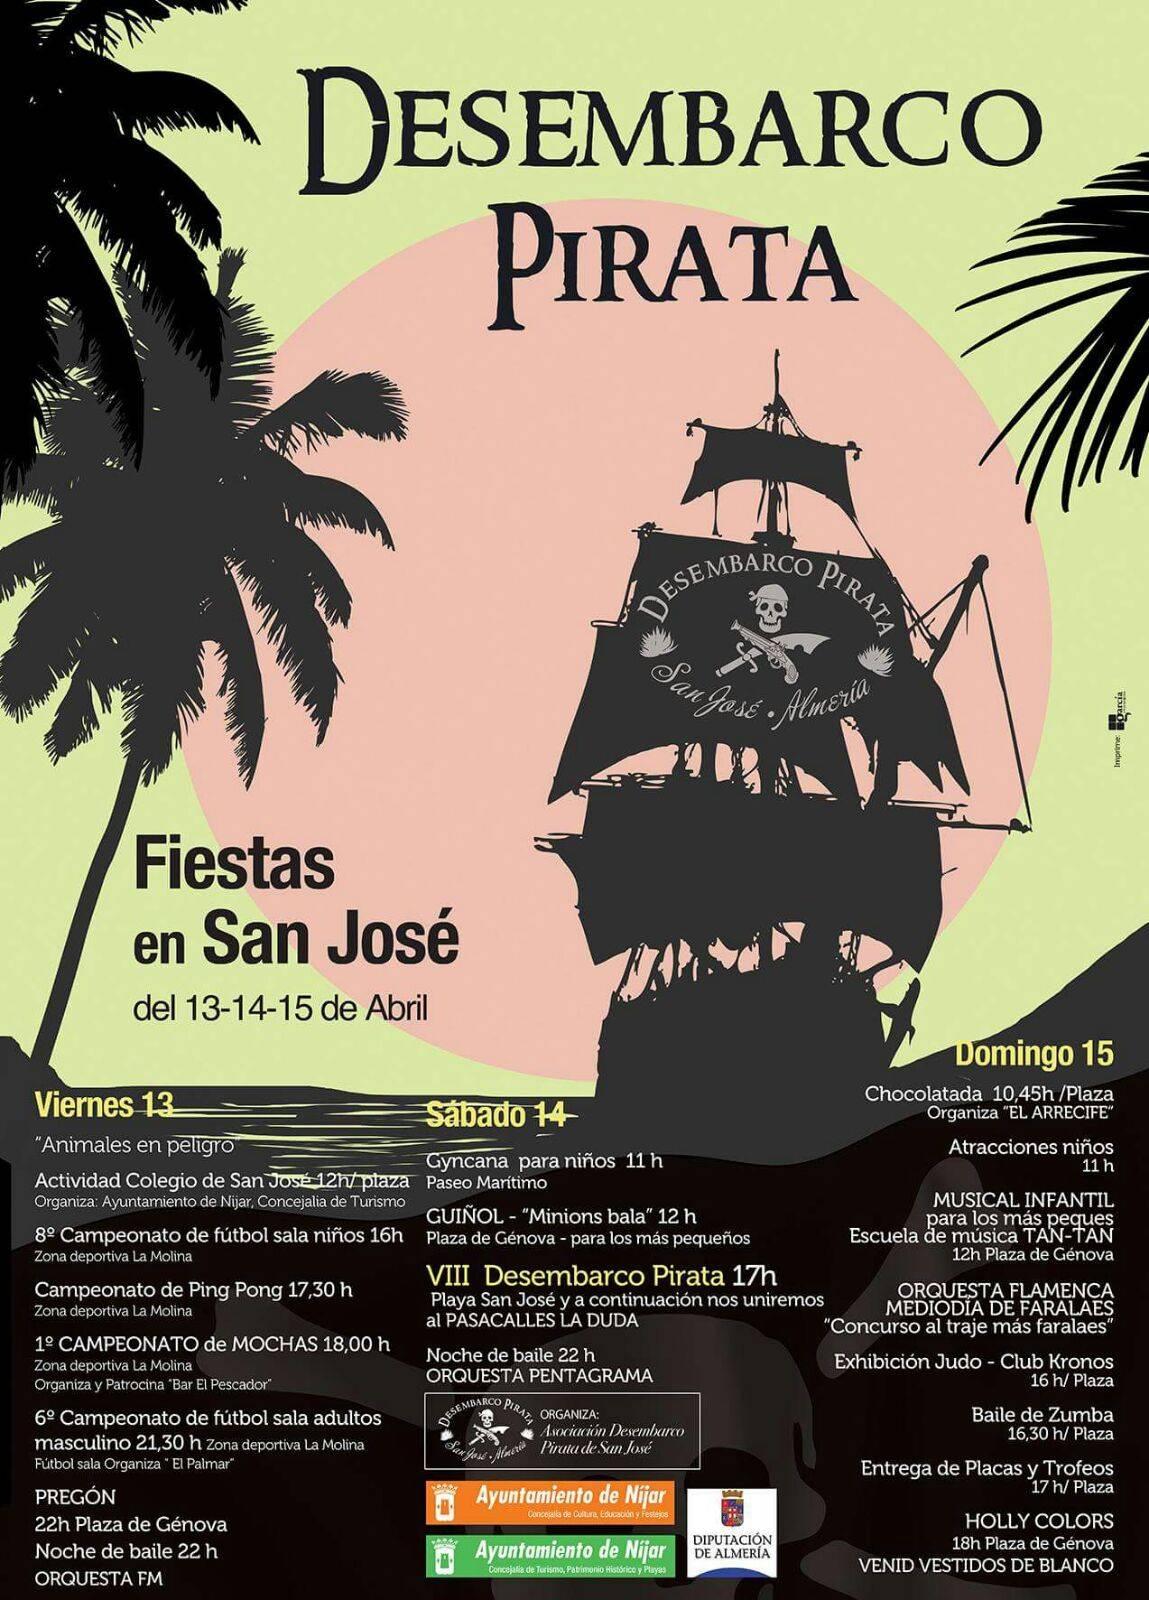 13, 14, 15 de Abril VIII Desembarco Pirata en San Jose  2018